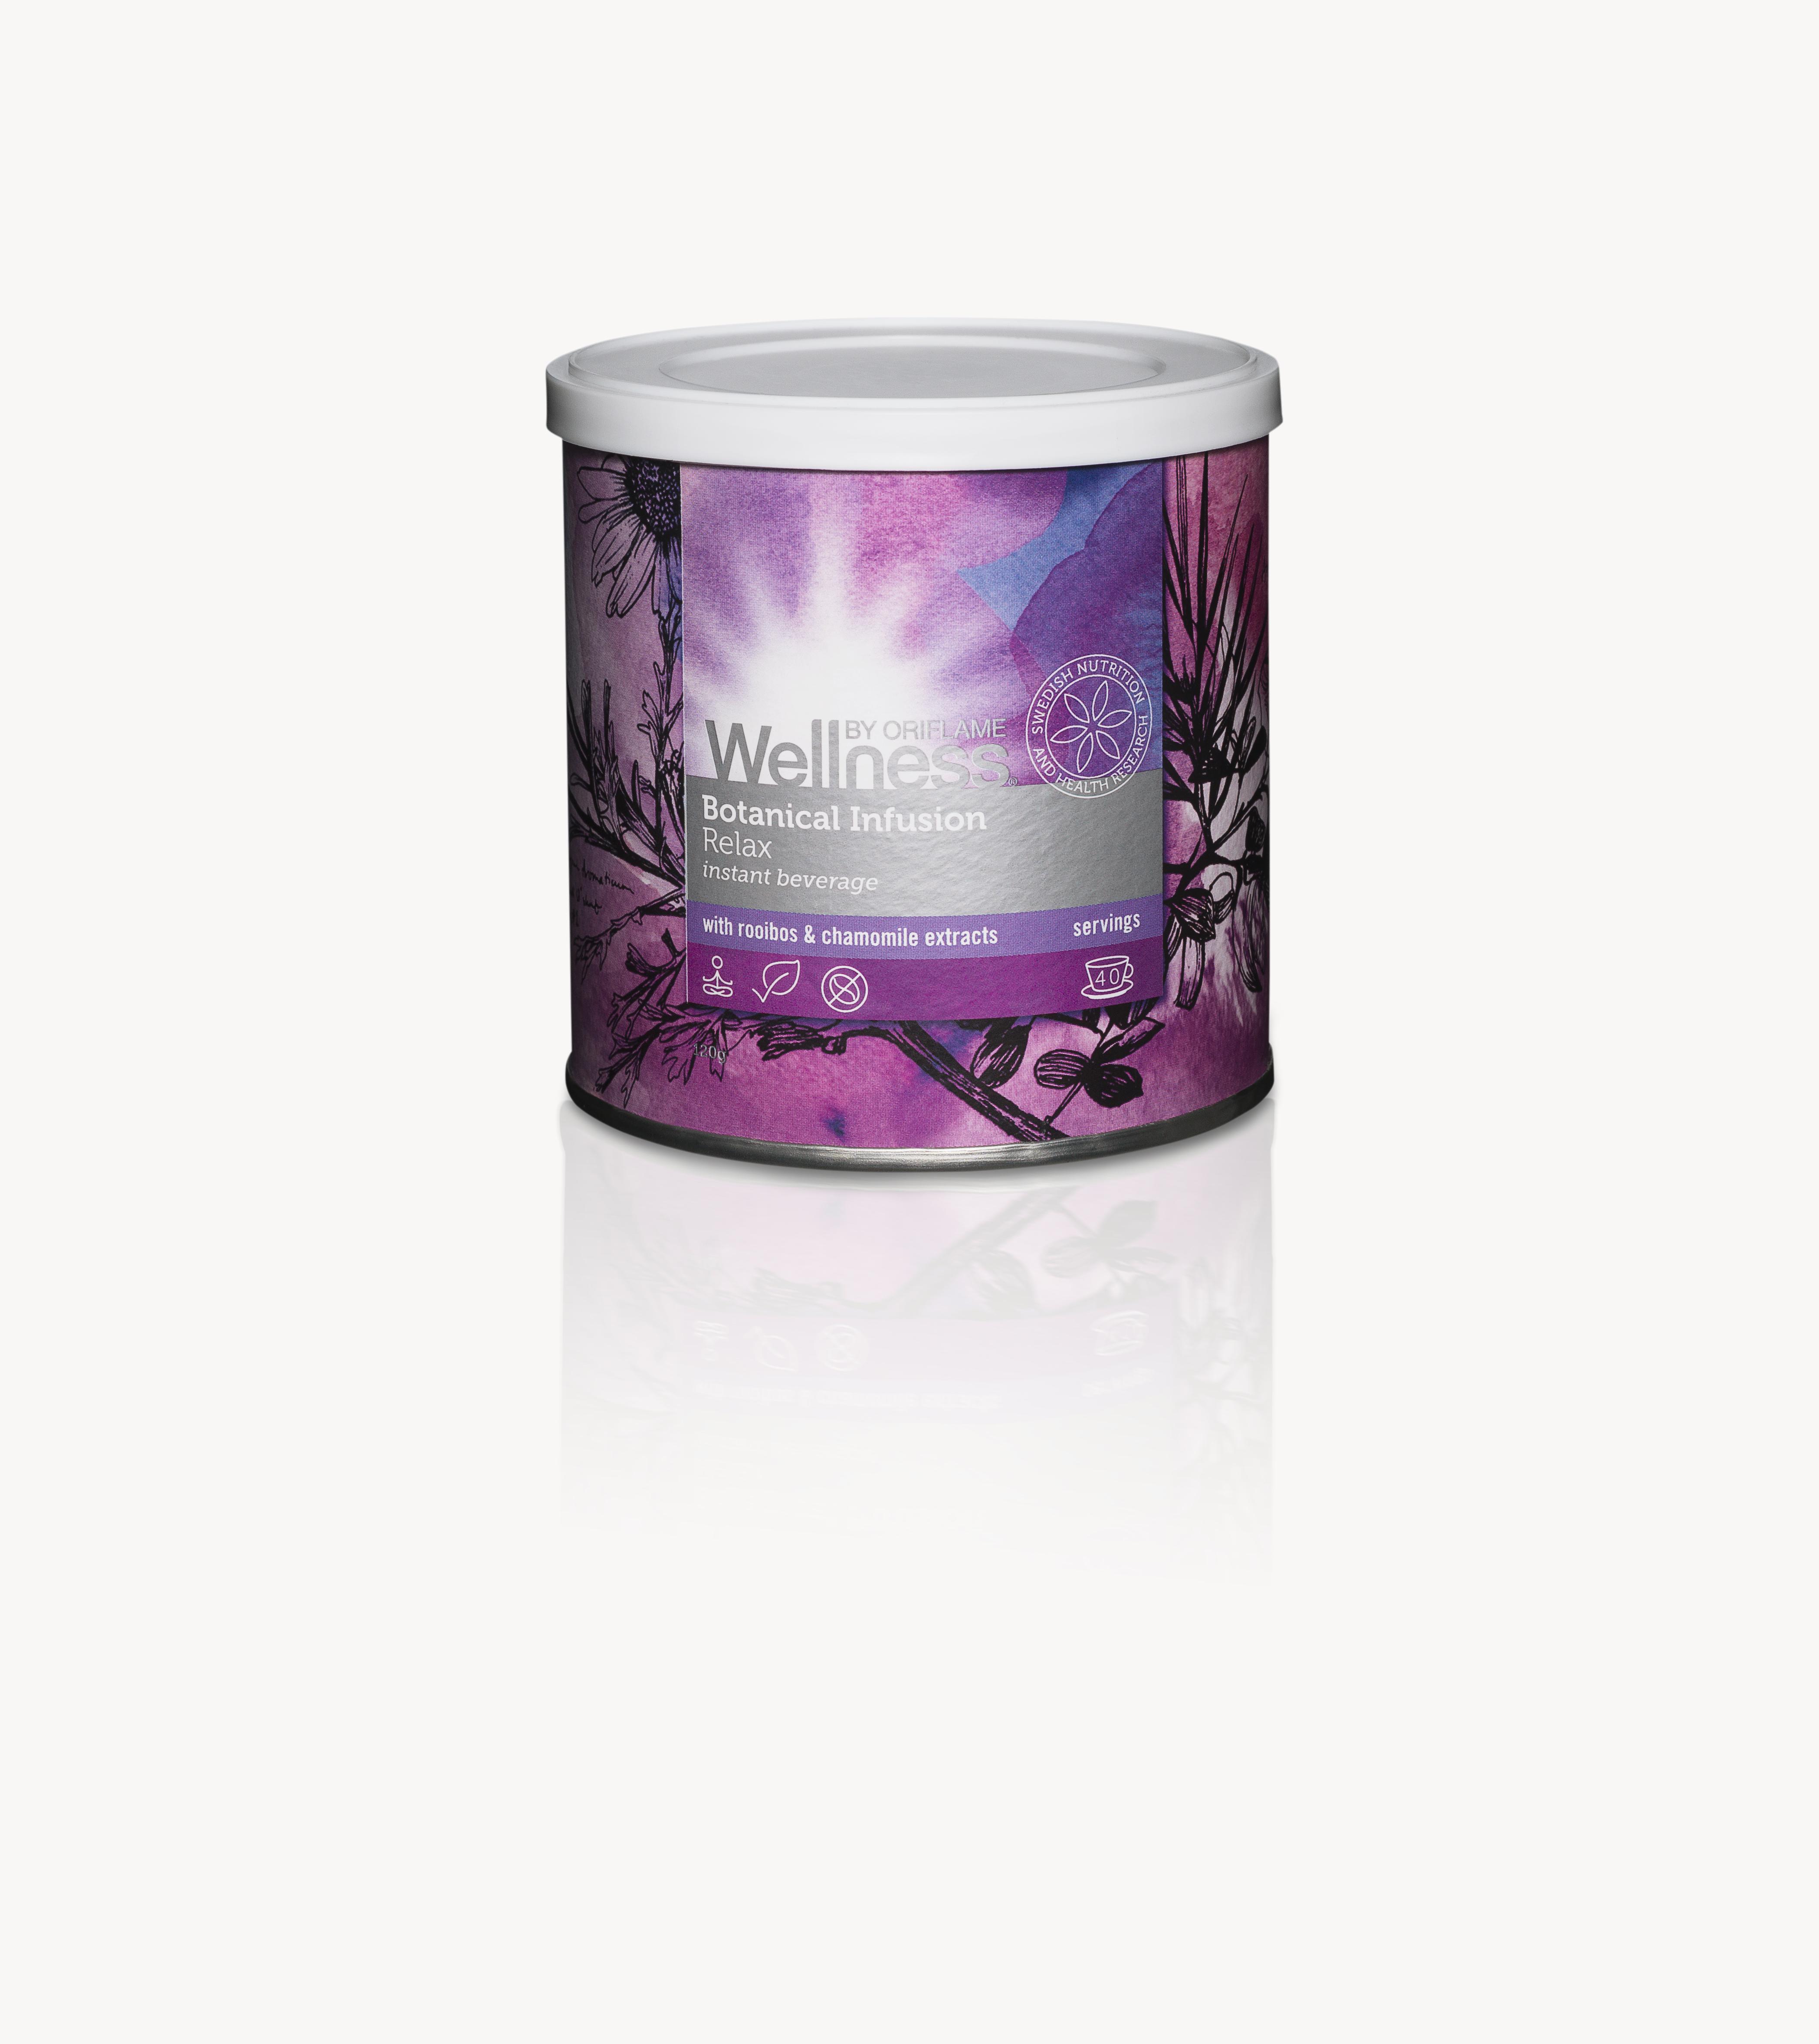 botanical infusion relaksujaca mieszanka Wellness by Oriflame